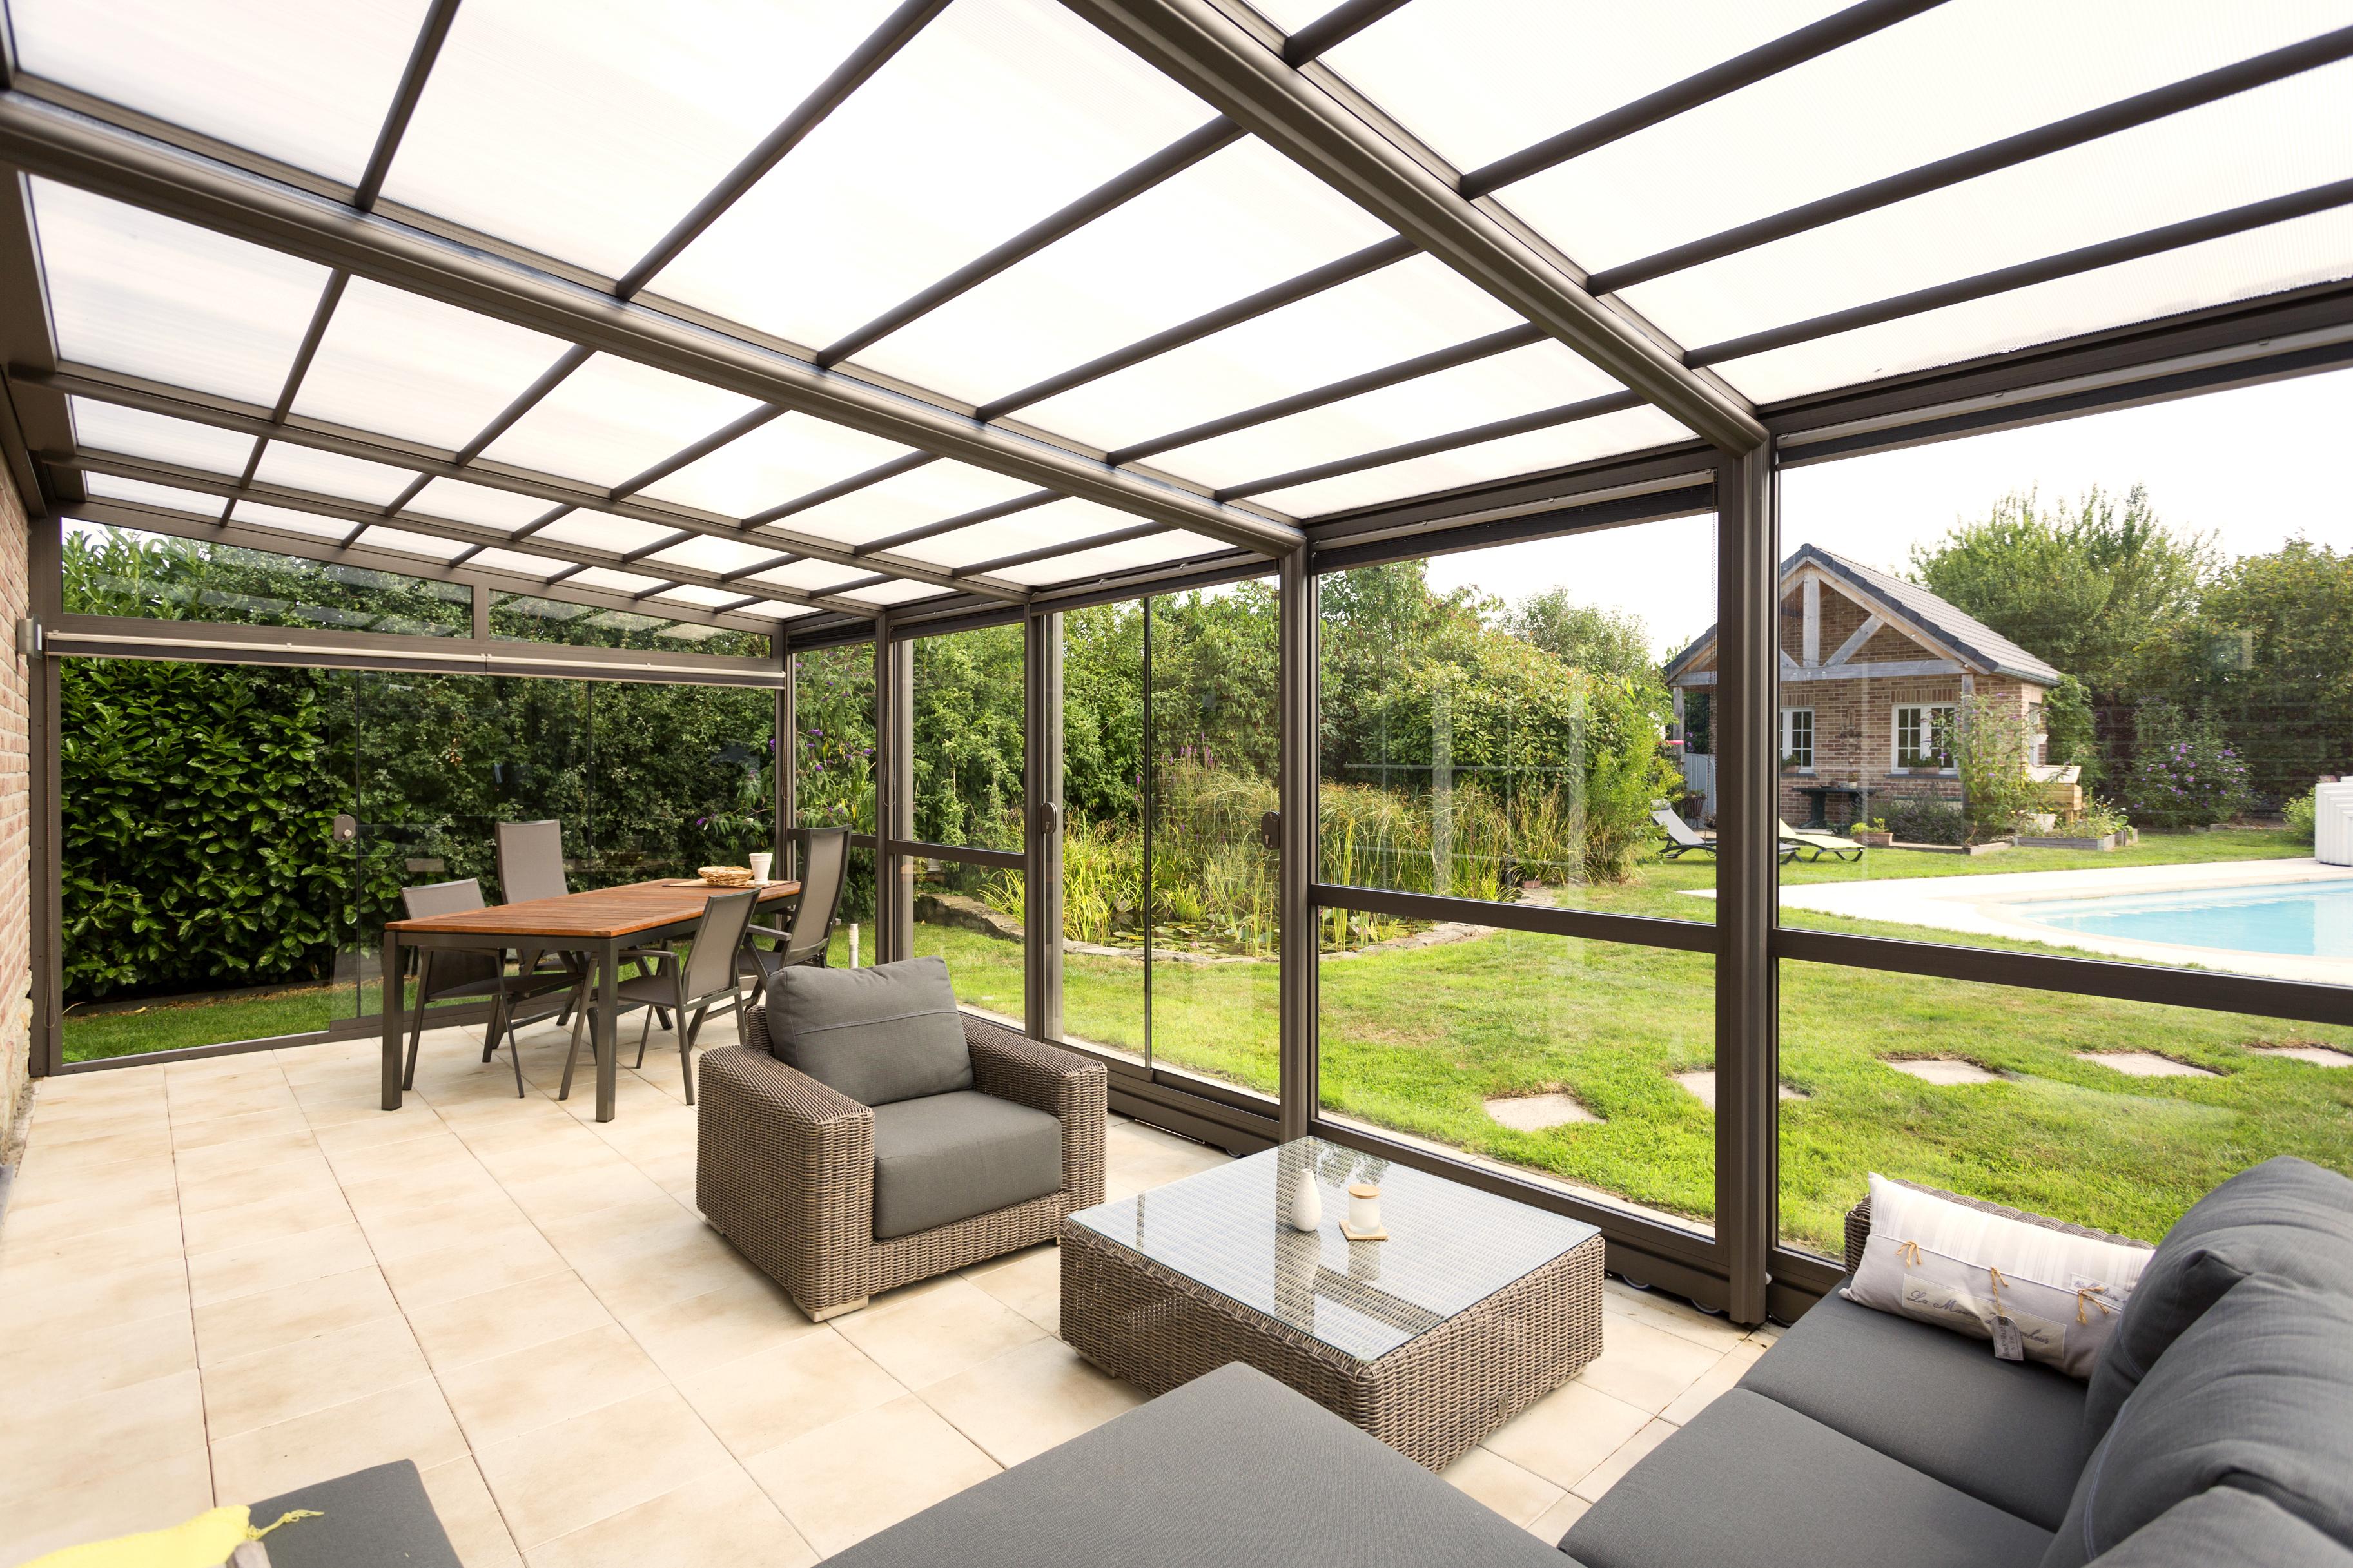 Abri De Terrasse En Aluminium - Verandair: Abris De Terrasse tout Abri De Terrasse Retractable